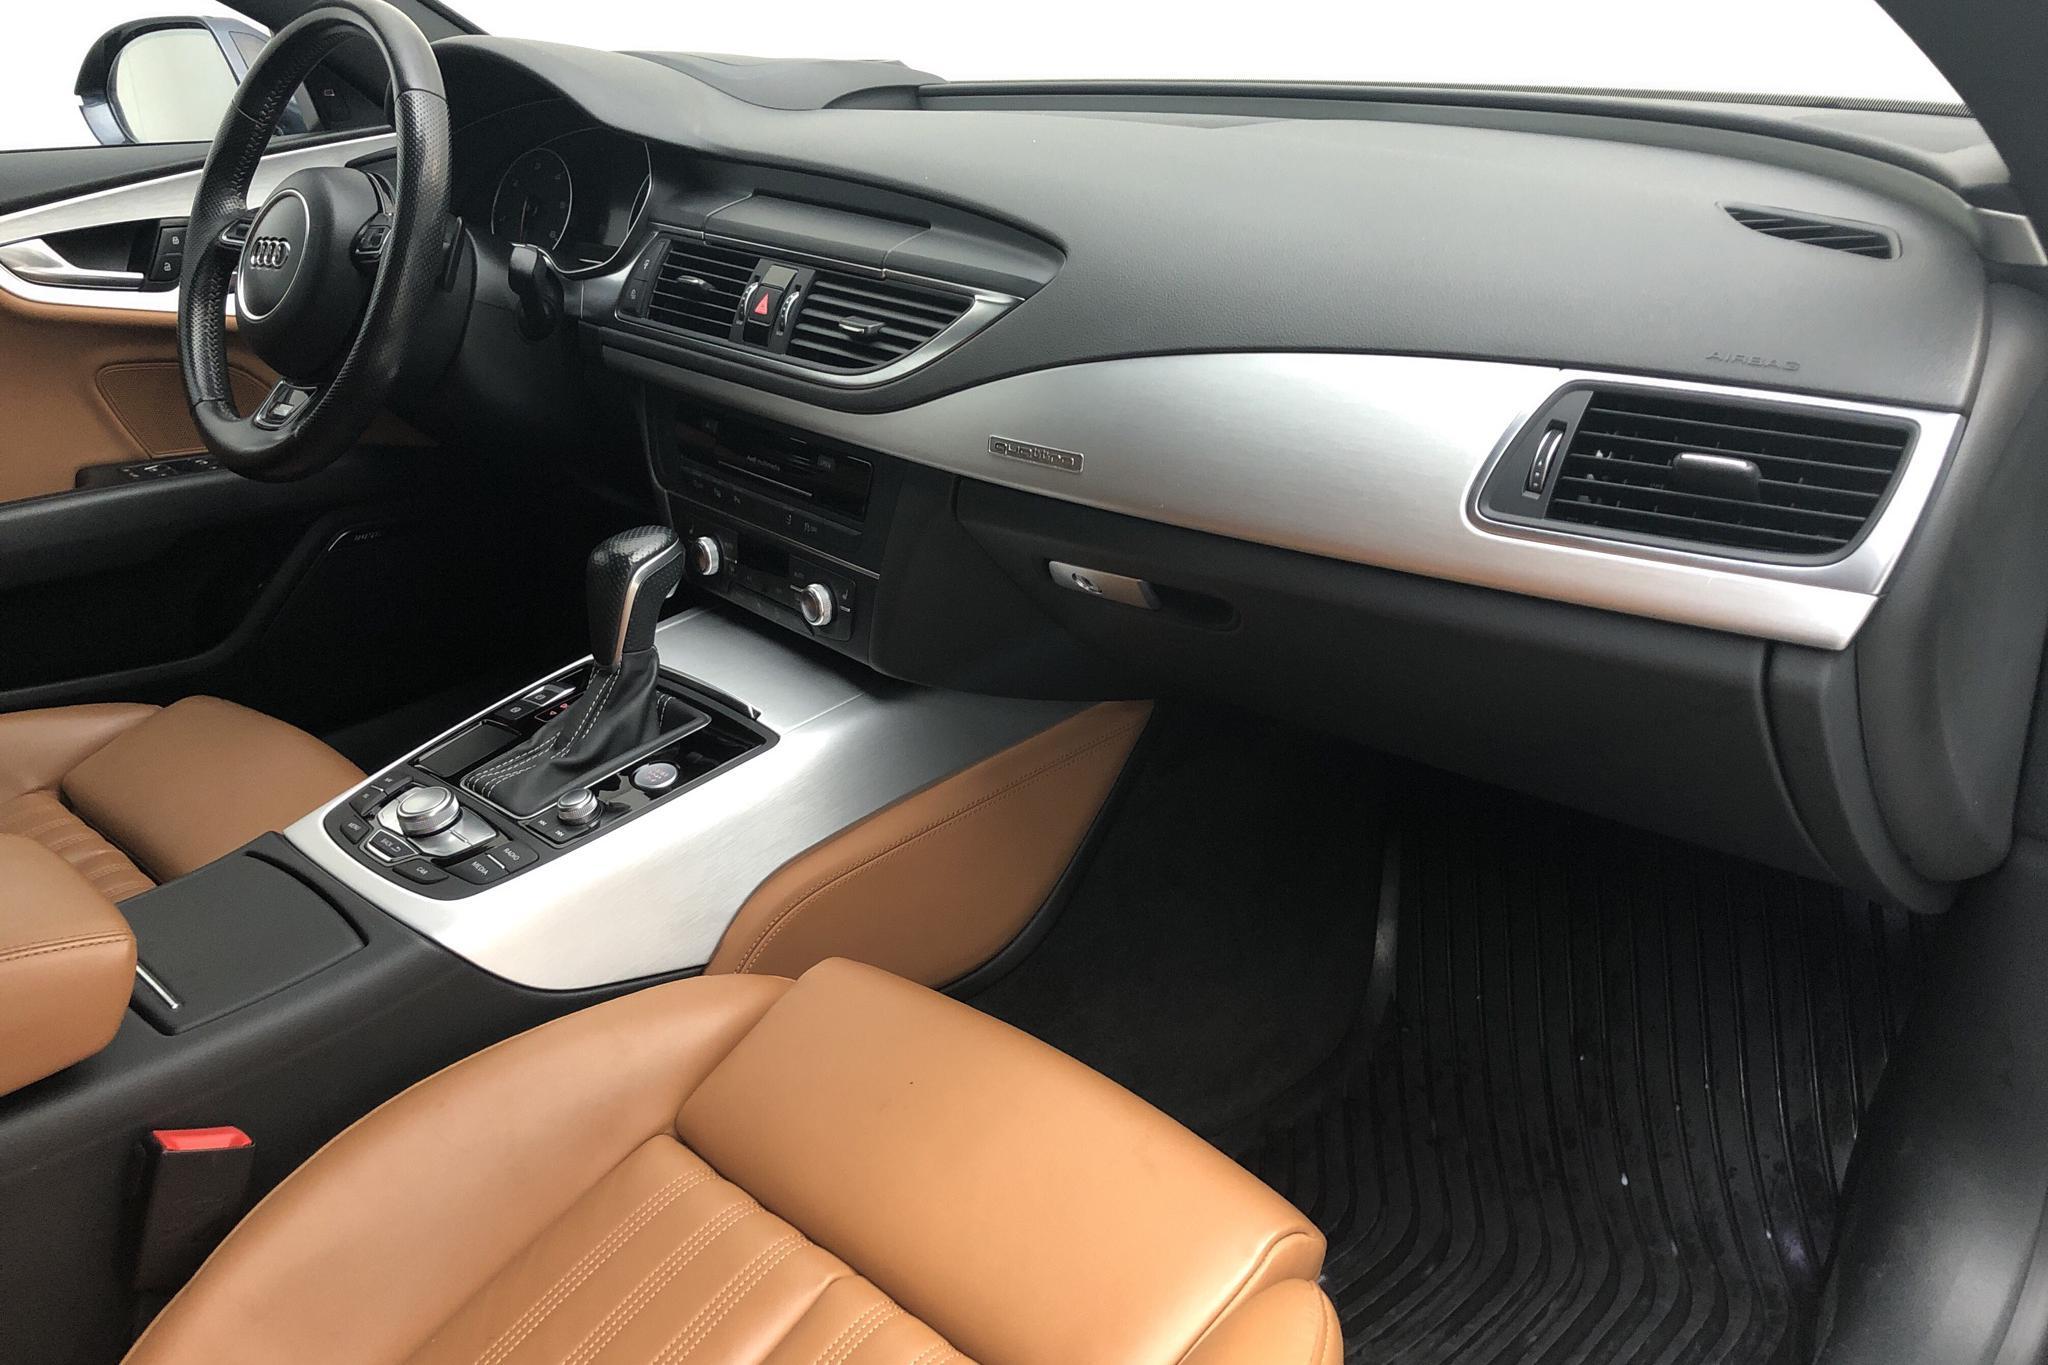 Audi A7 3.0 TDI Sportback quattro (272hk) - 11 500 mil - Automat - blå - 2016